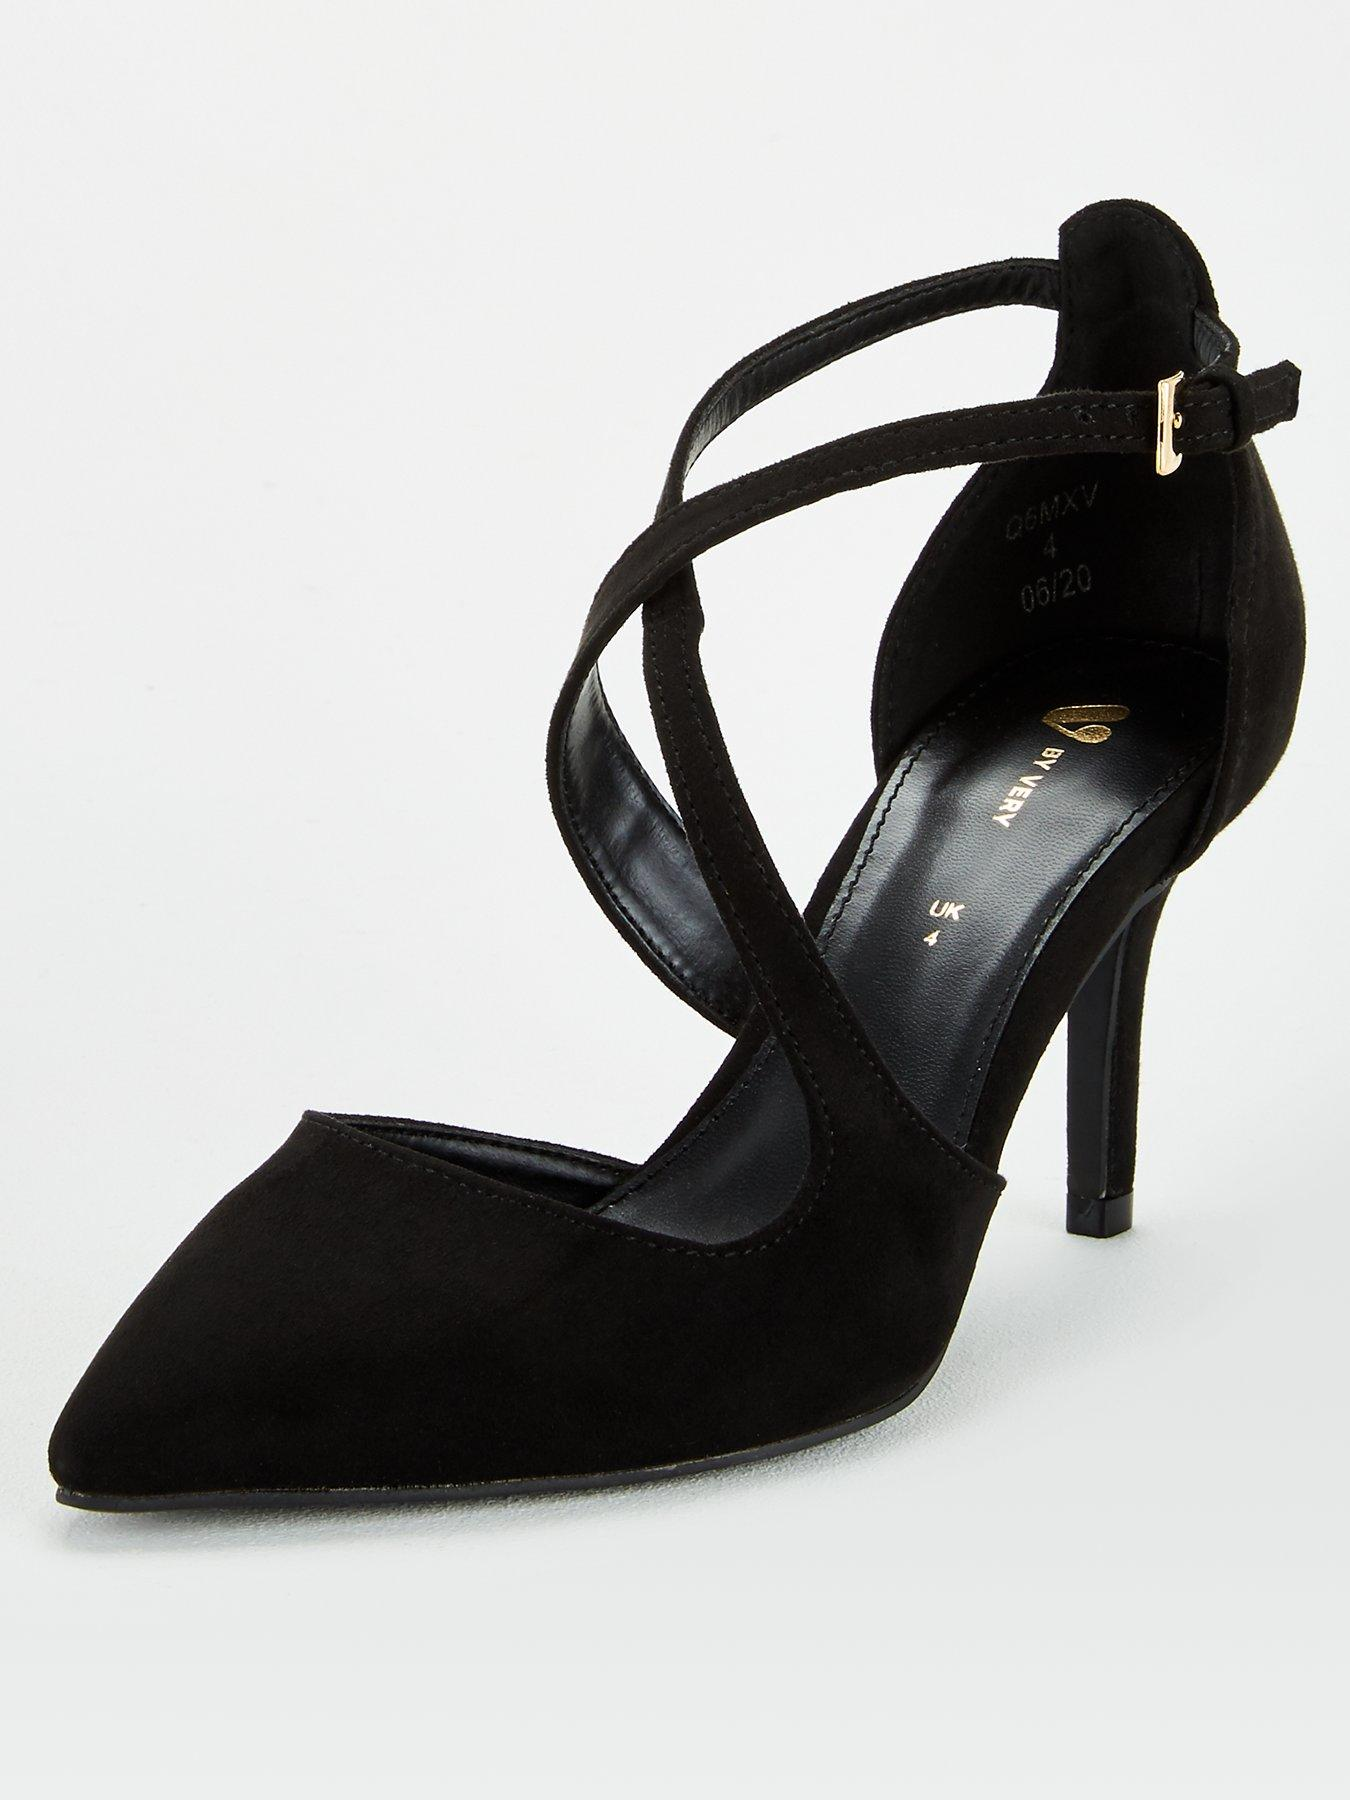 Black | Heeled Shoes | Heels | Shoes